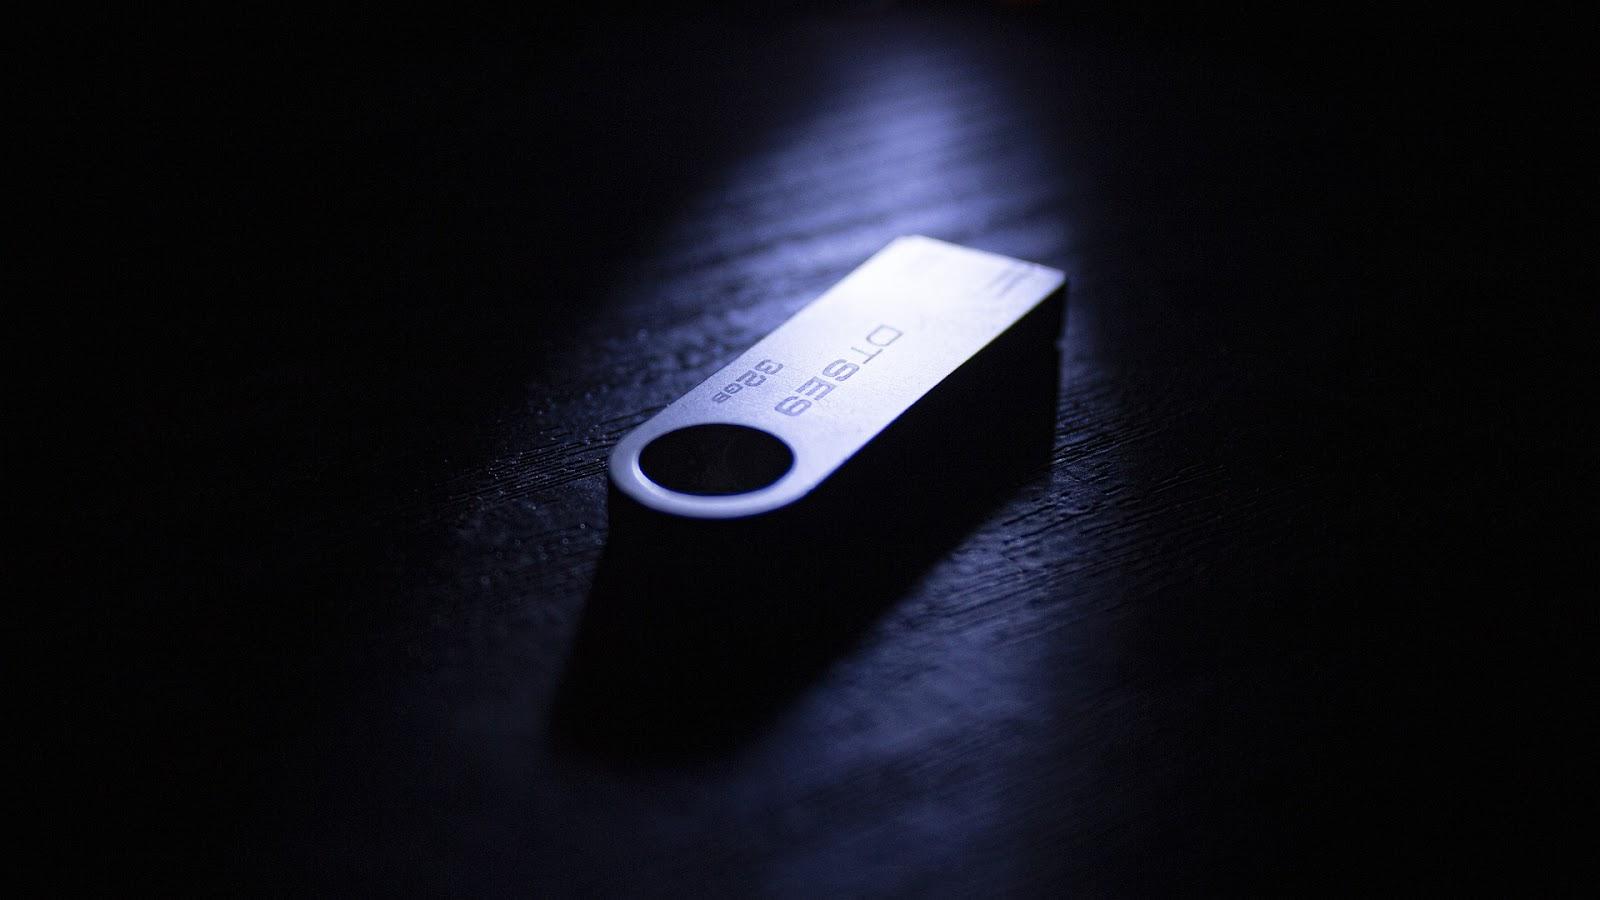 BitLocker Password on flash drive